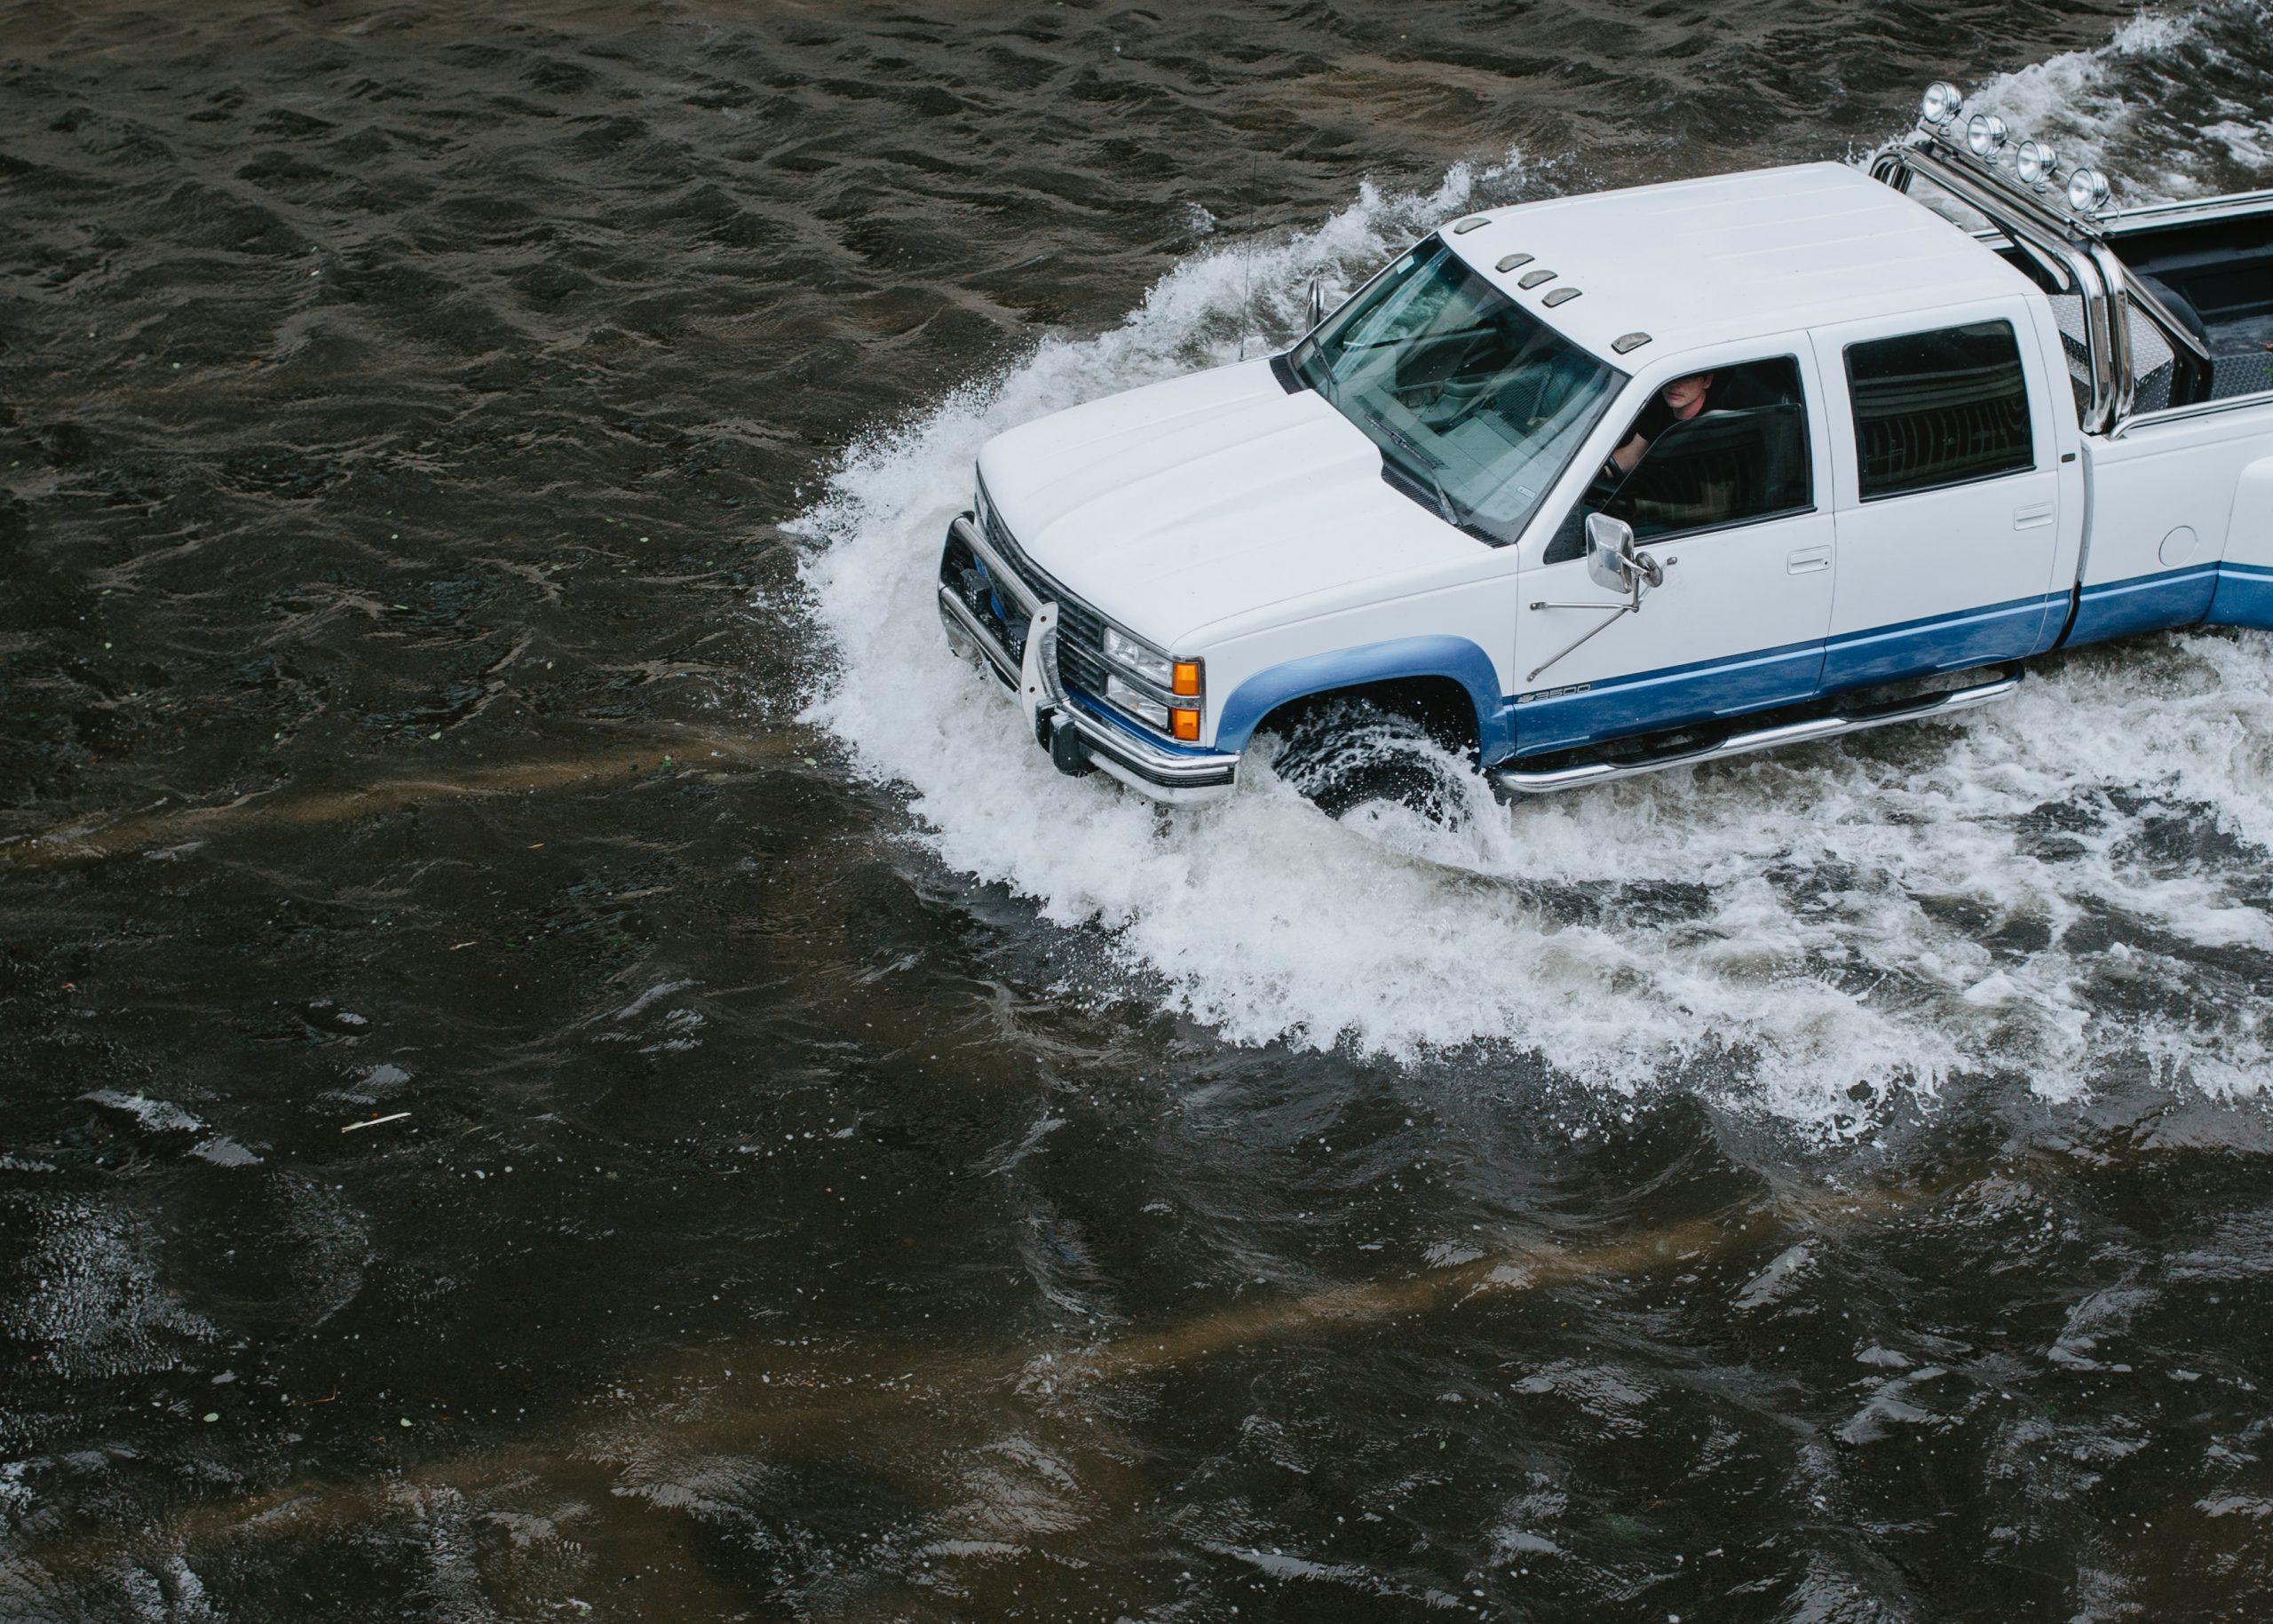 Emergency Response Truck Drives through deep water